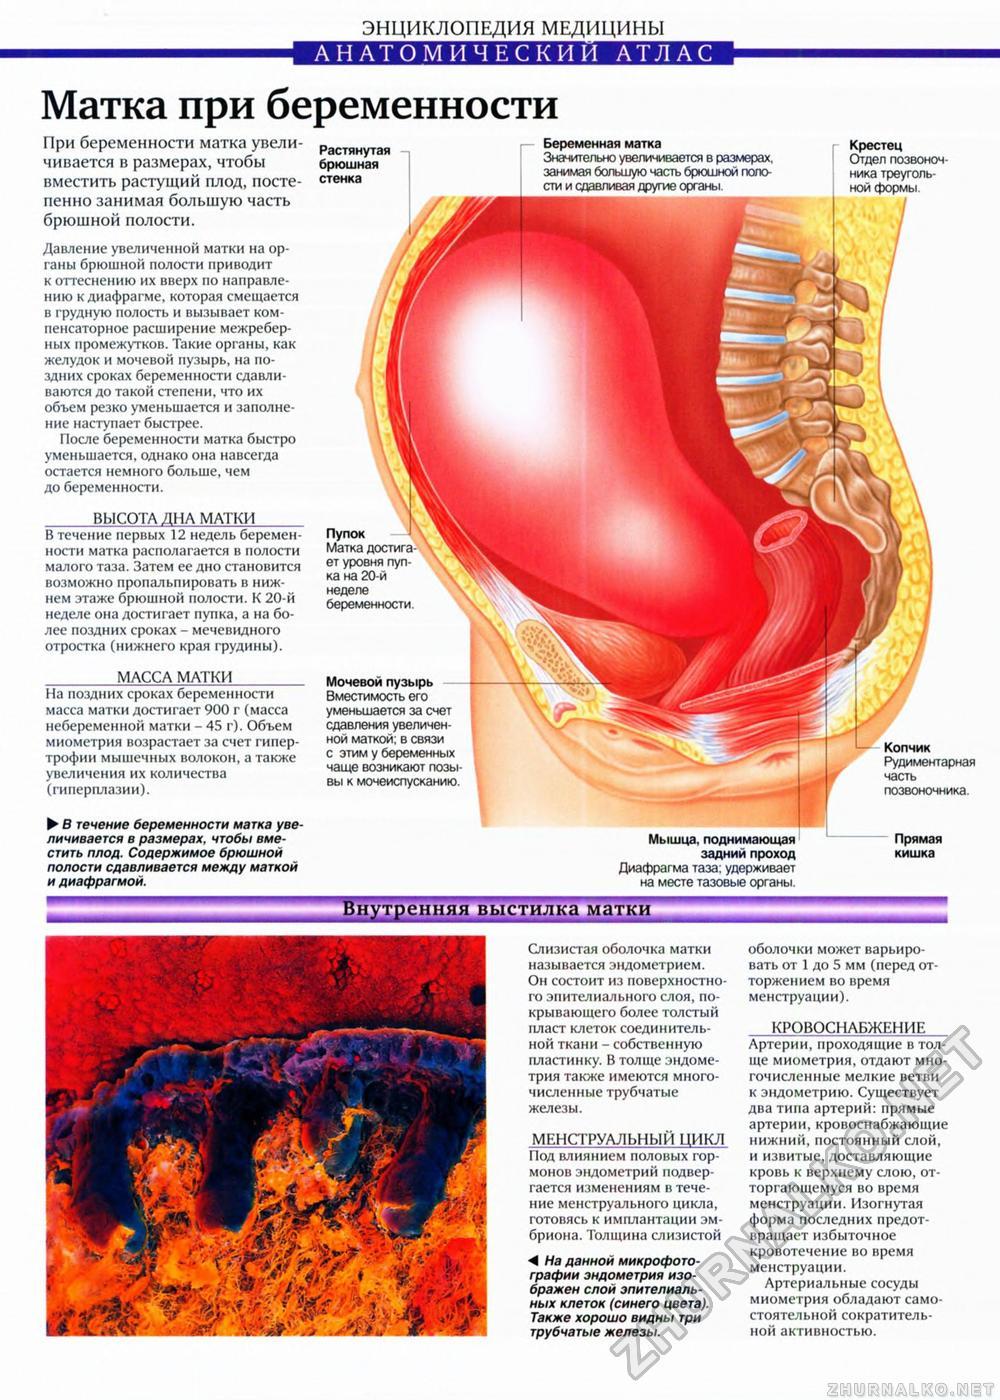 Тело матки при беременности